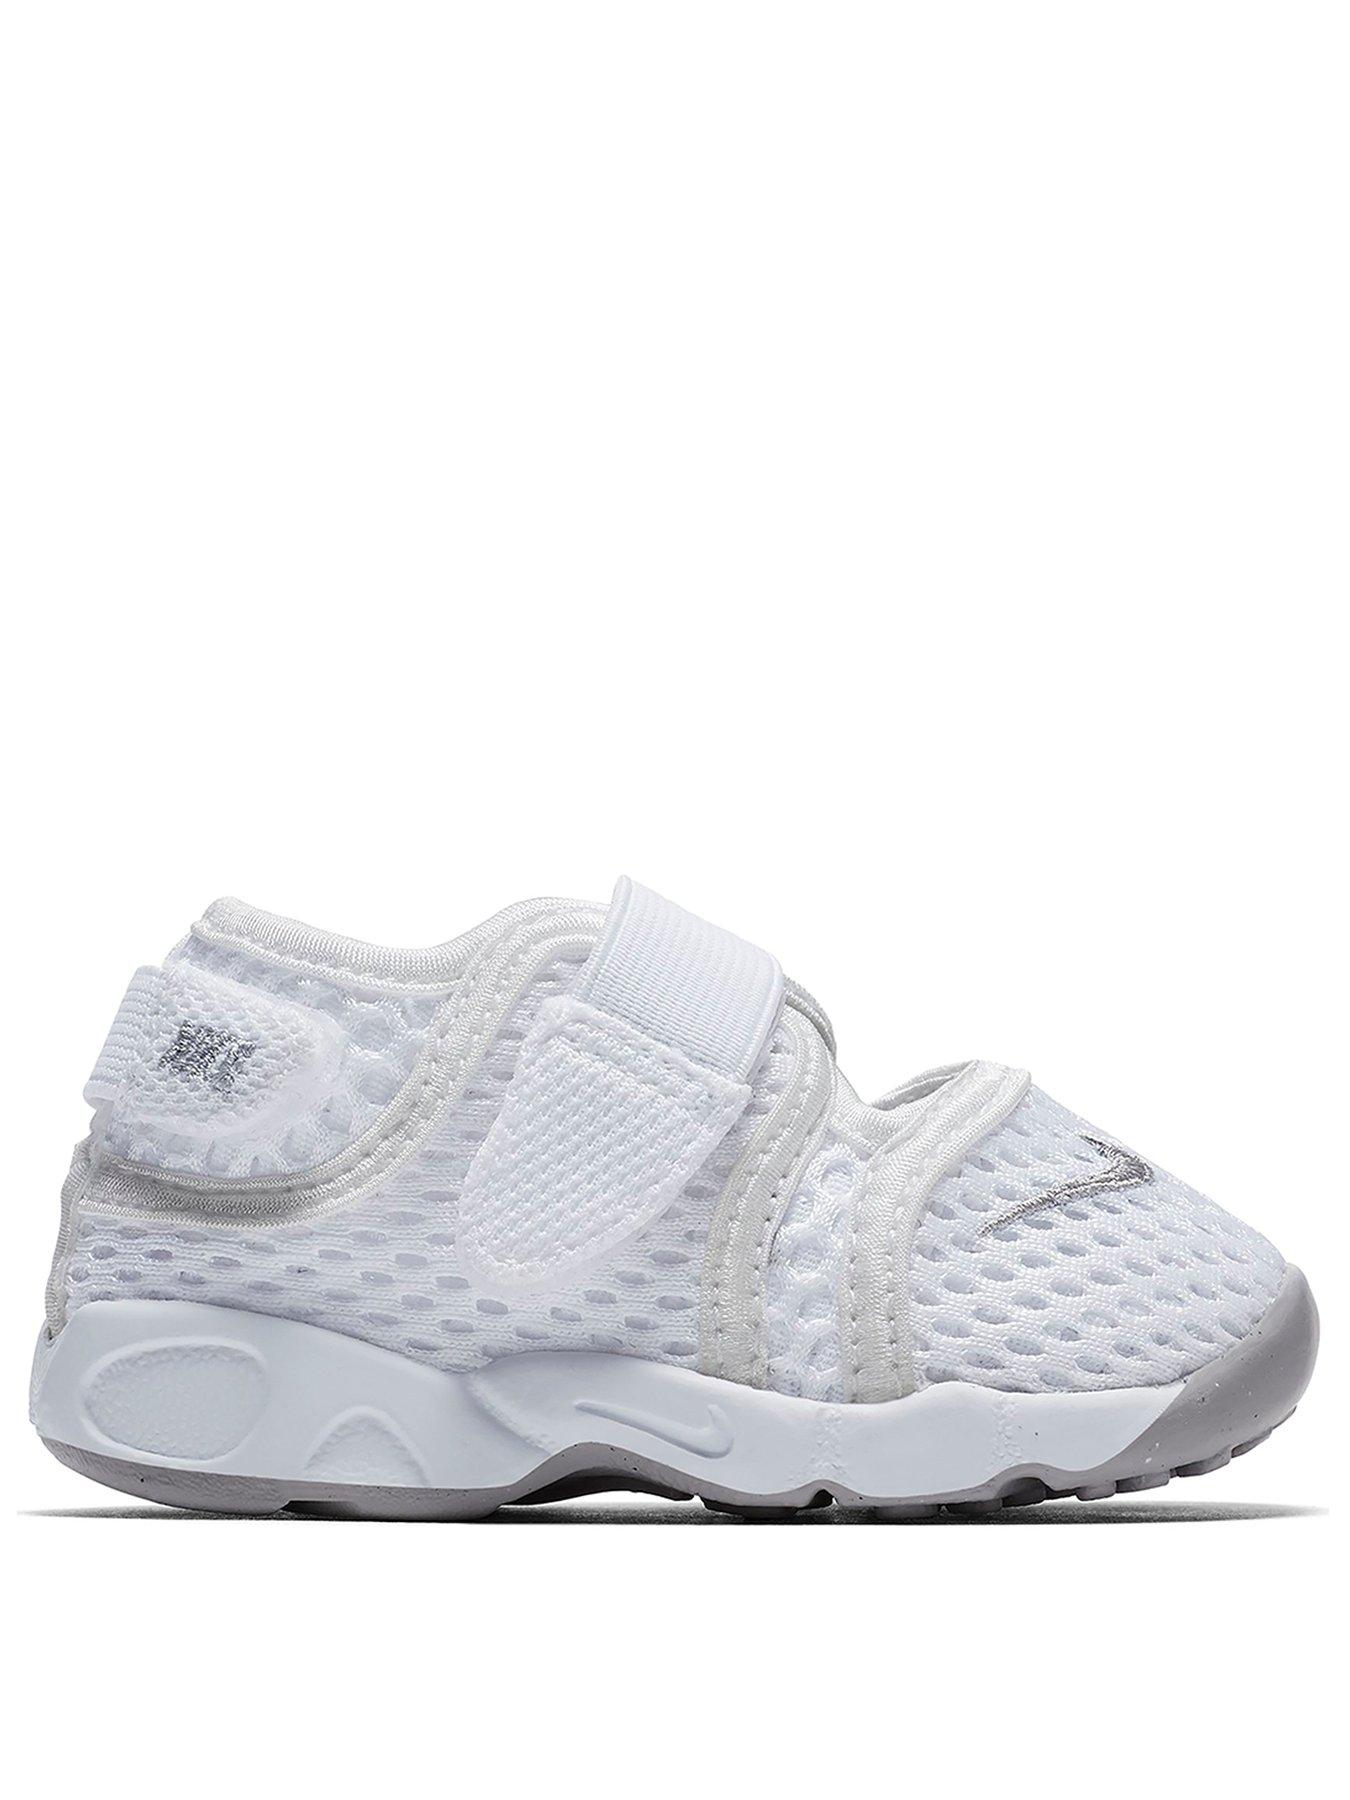 Nike Rift Infants Trainers - White/Grey